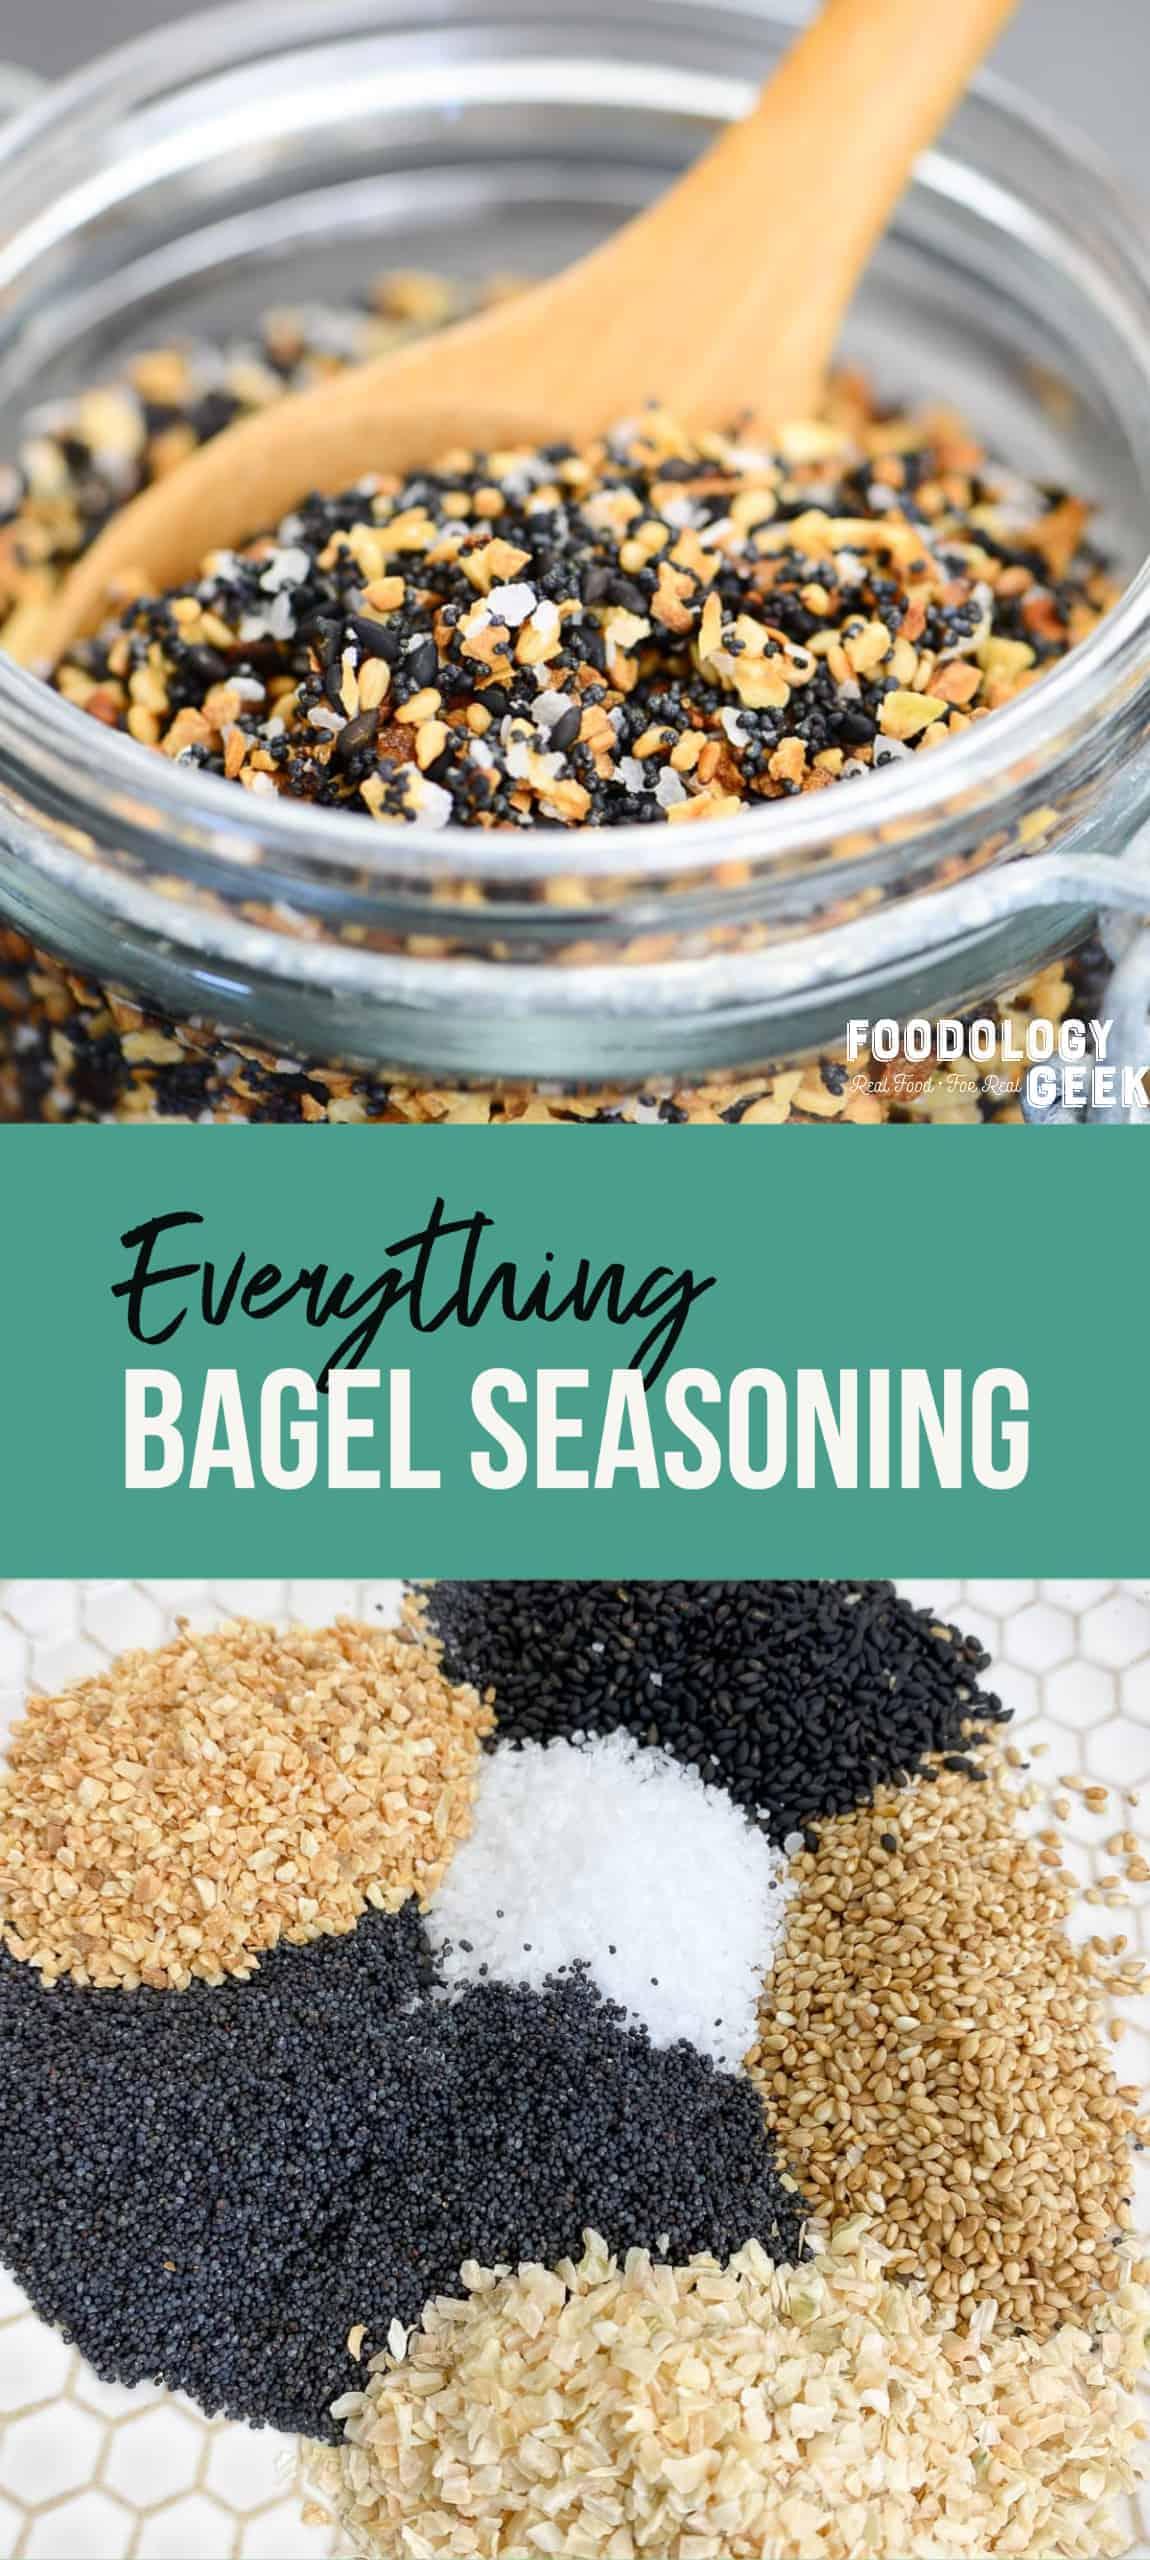 make your own everything bagel topping   foodology geek